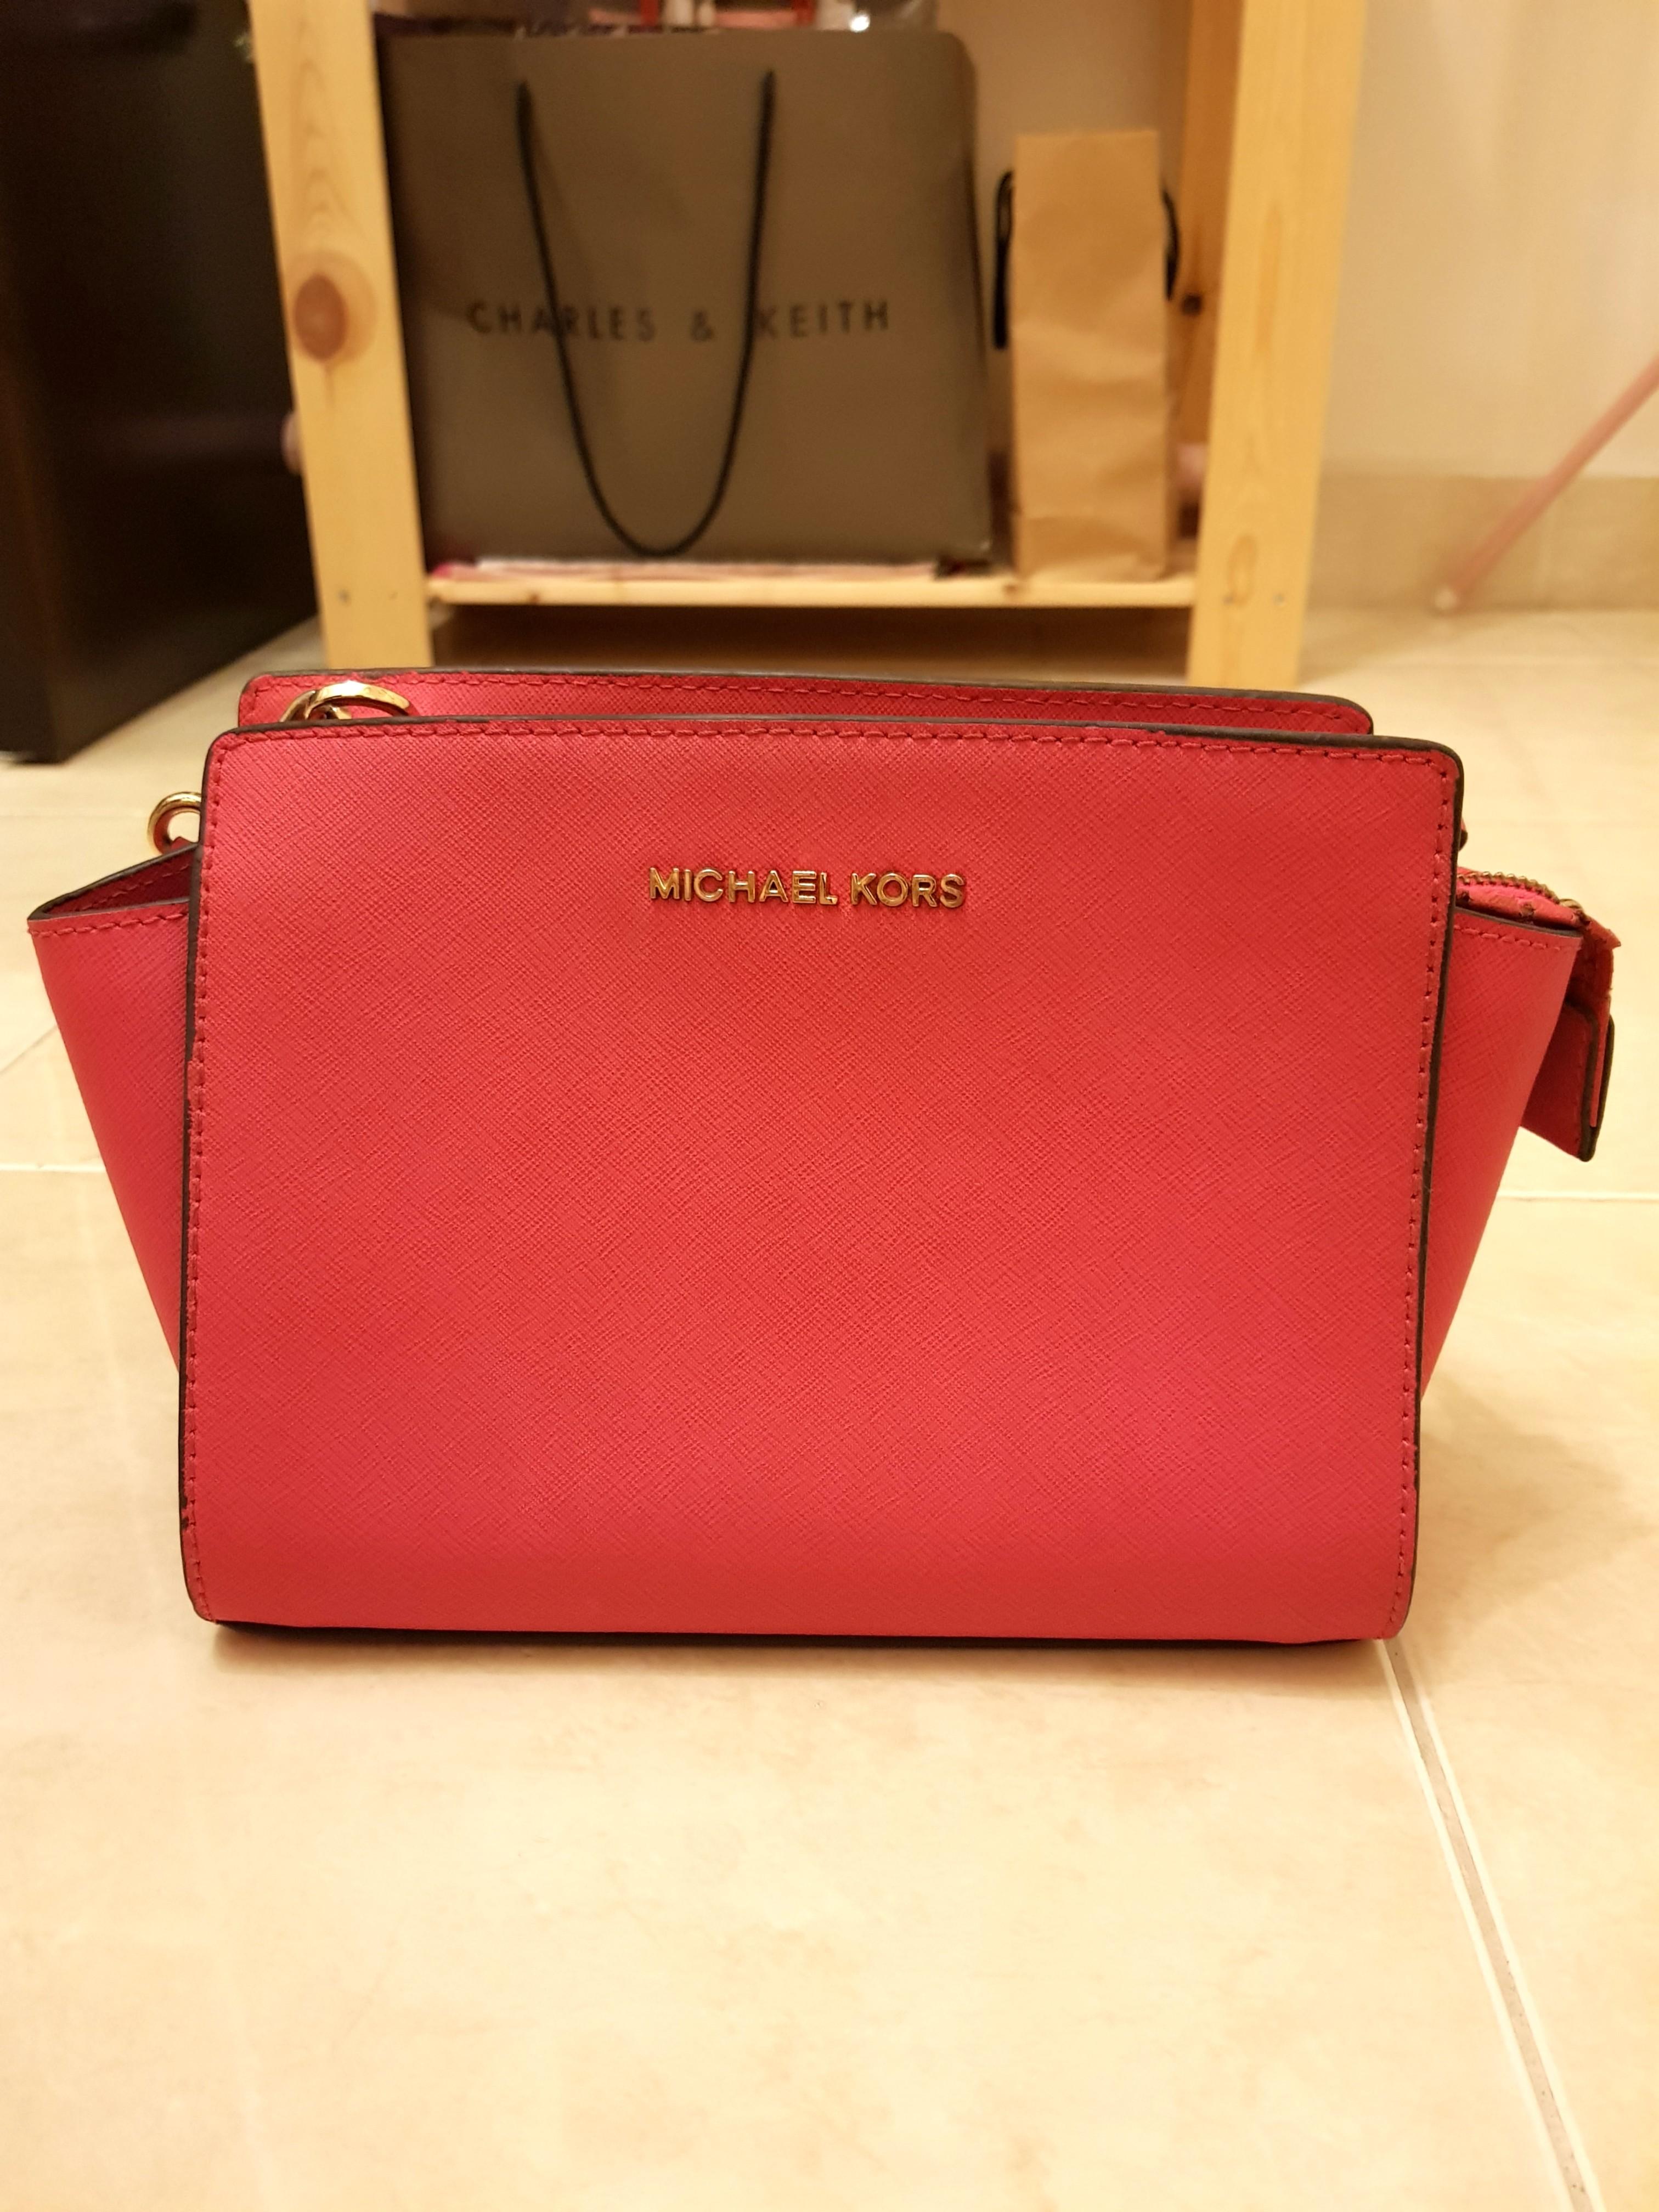 41879ae73cec Michael Kors Selma Small Size, Women's Fashion, Bags & Wallets on ...